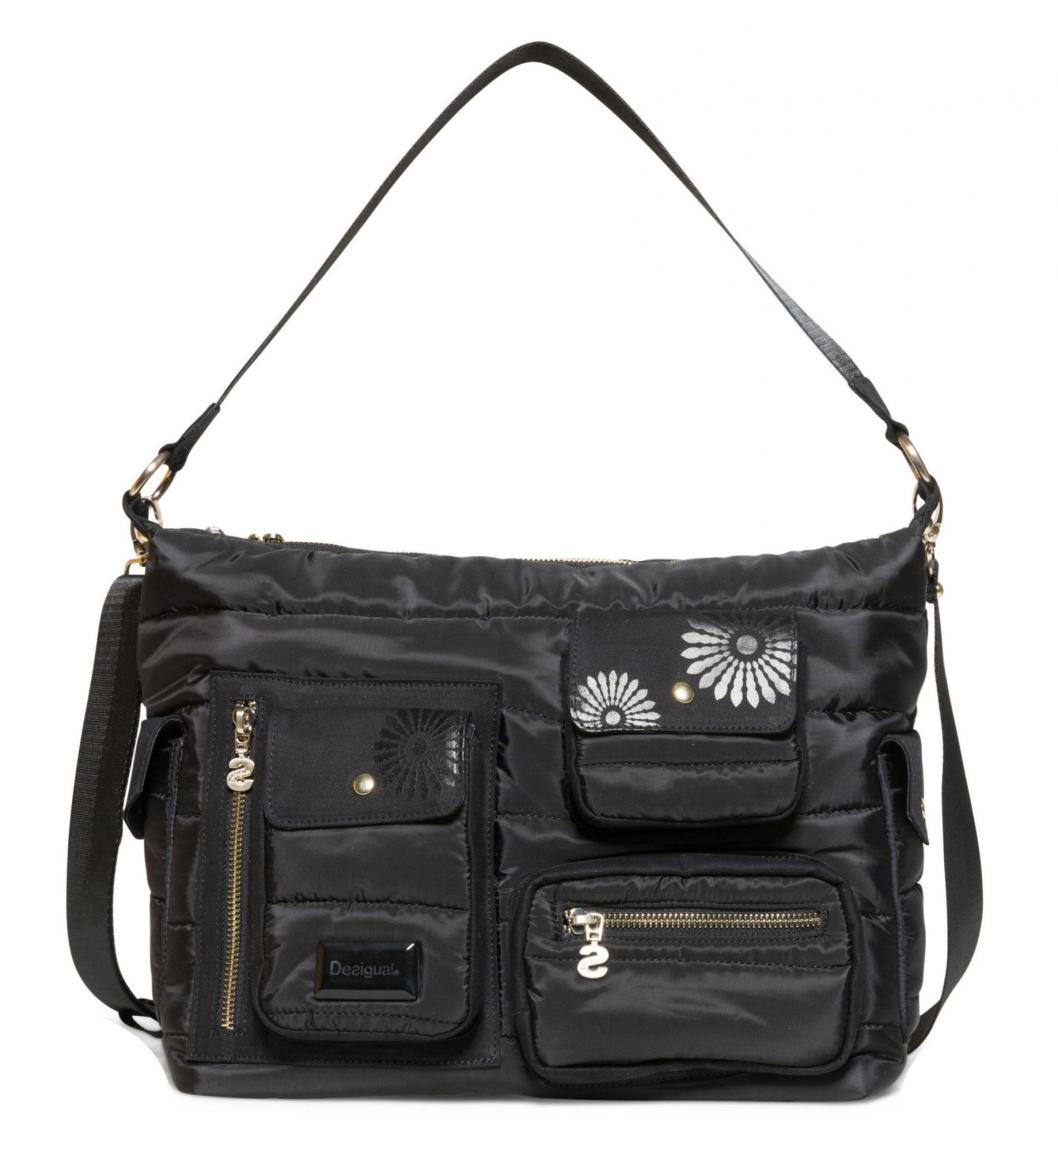 f27d25a2038c2 Multipocket-Tasche Desigual Magic Memphis schwarz Blumen - Bags   more